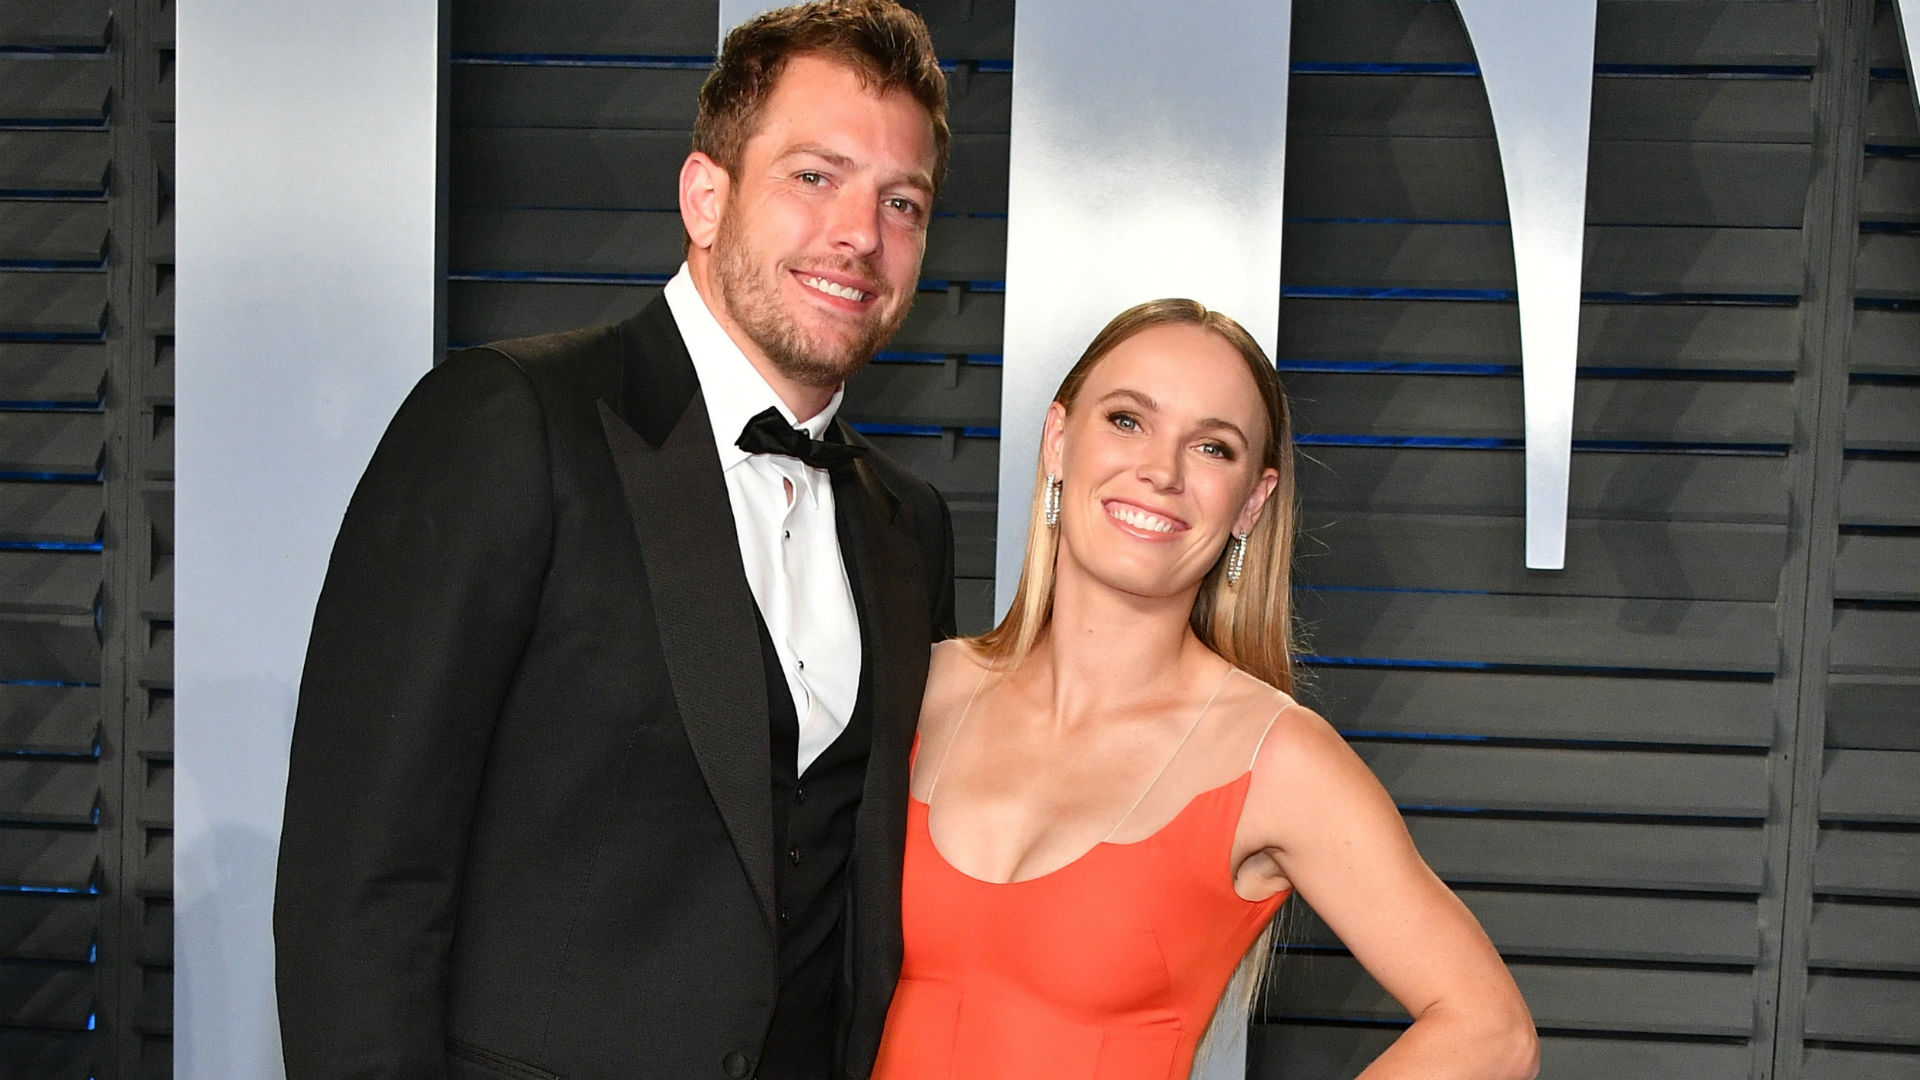 Caroline Wozniacki, David Lee marry; star athletes in wedding party